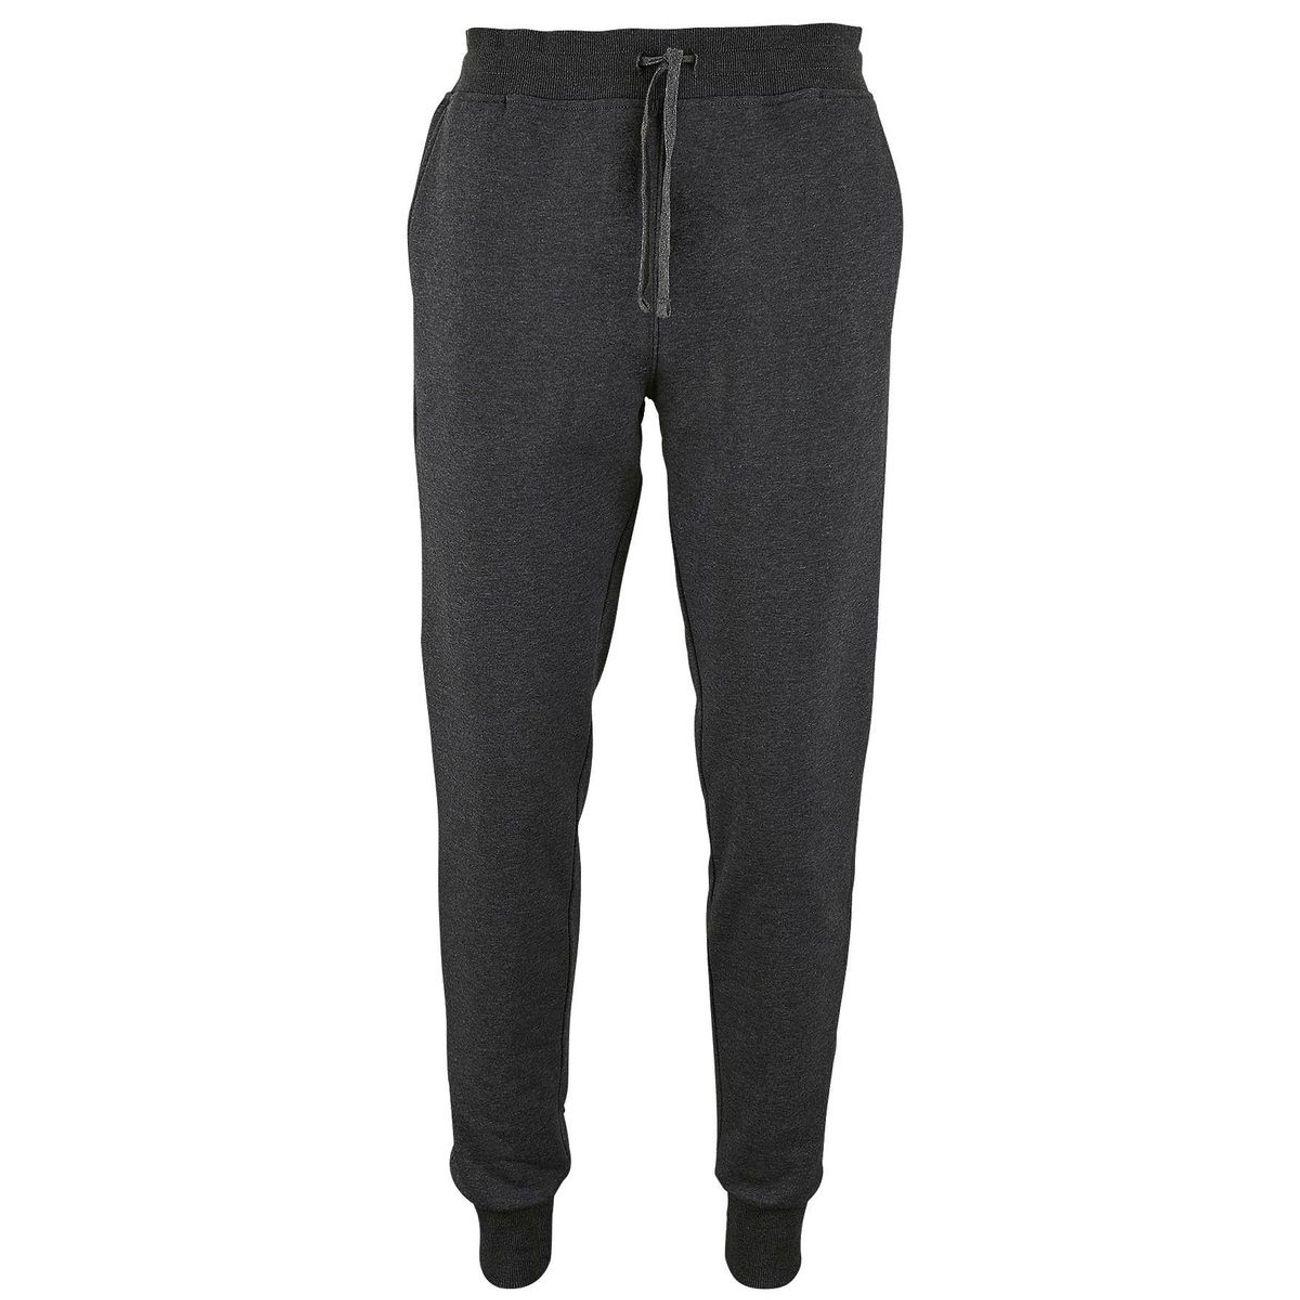 newest collection 58797 d8bbc pantalon-jogging-homme-coupe-slim---homme ---02084---gris-anthracite 1 v3.jpeg